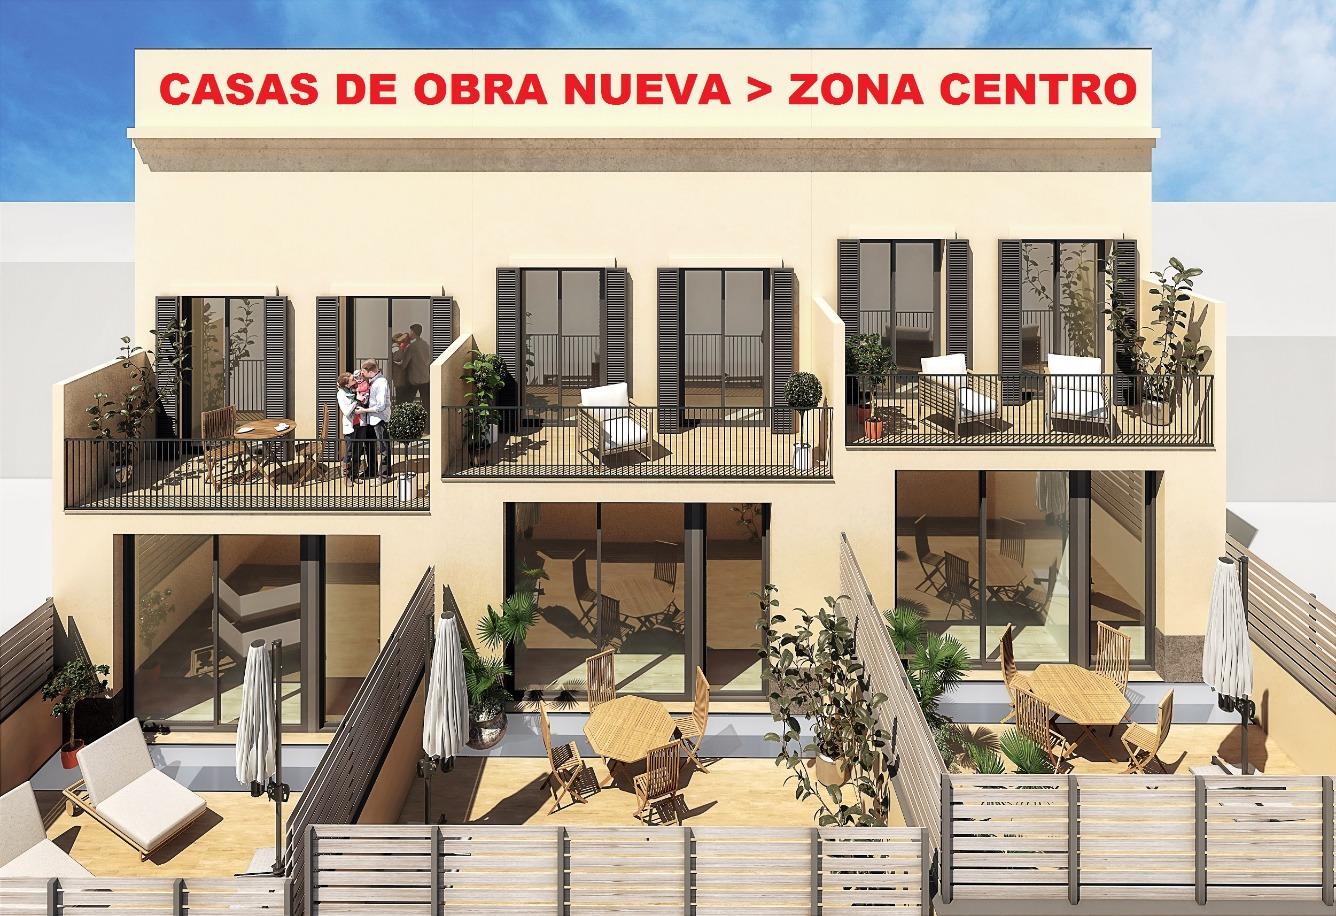 Casa  Calle carrer de santa coloma. Nueva promoción de casas en zona centro.  desde 220m2. ascensor